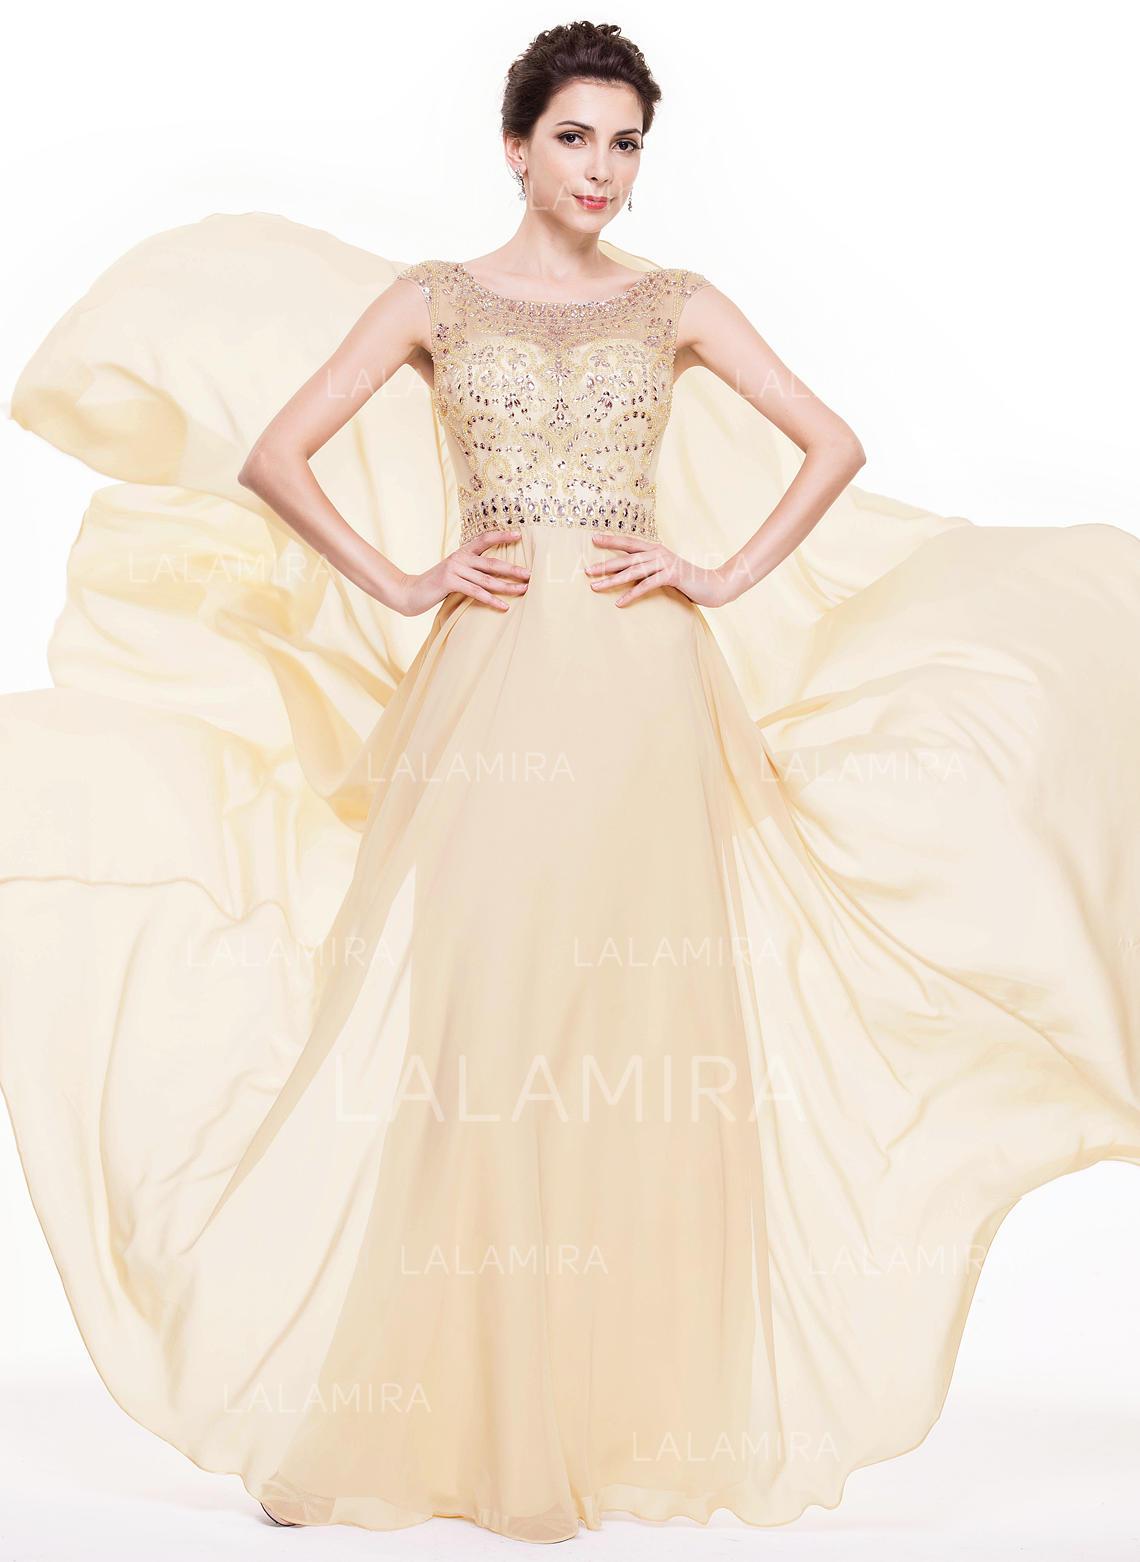 cb3256e30a8 A-Line Princess Chiffon Prom Dresses Beading Sequins Scoop Neck Sleeveless  Floor-Length. Loading zoom